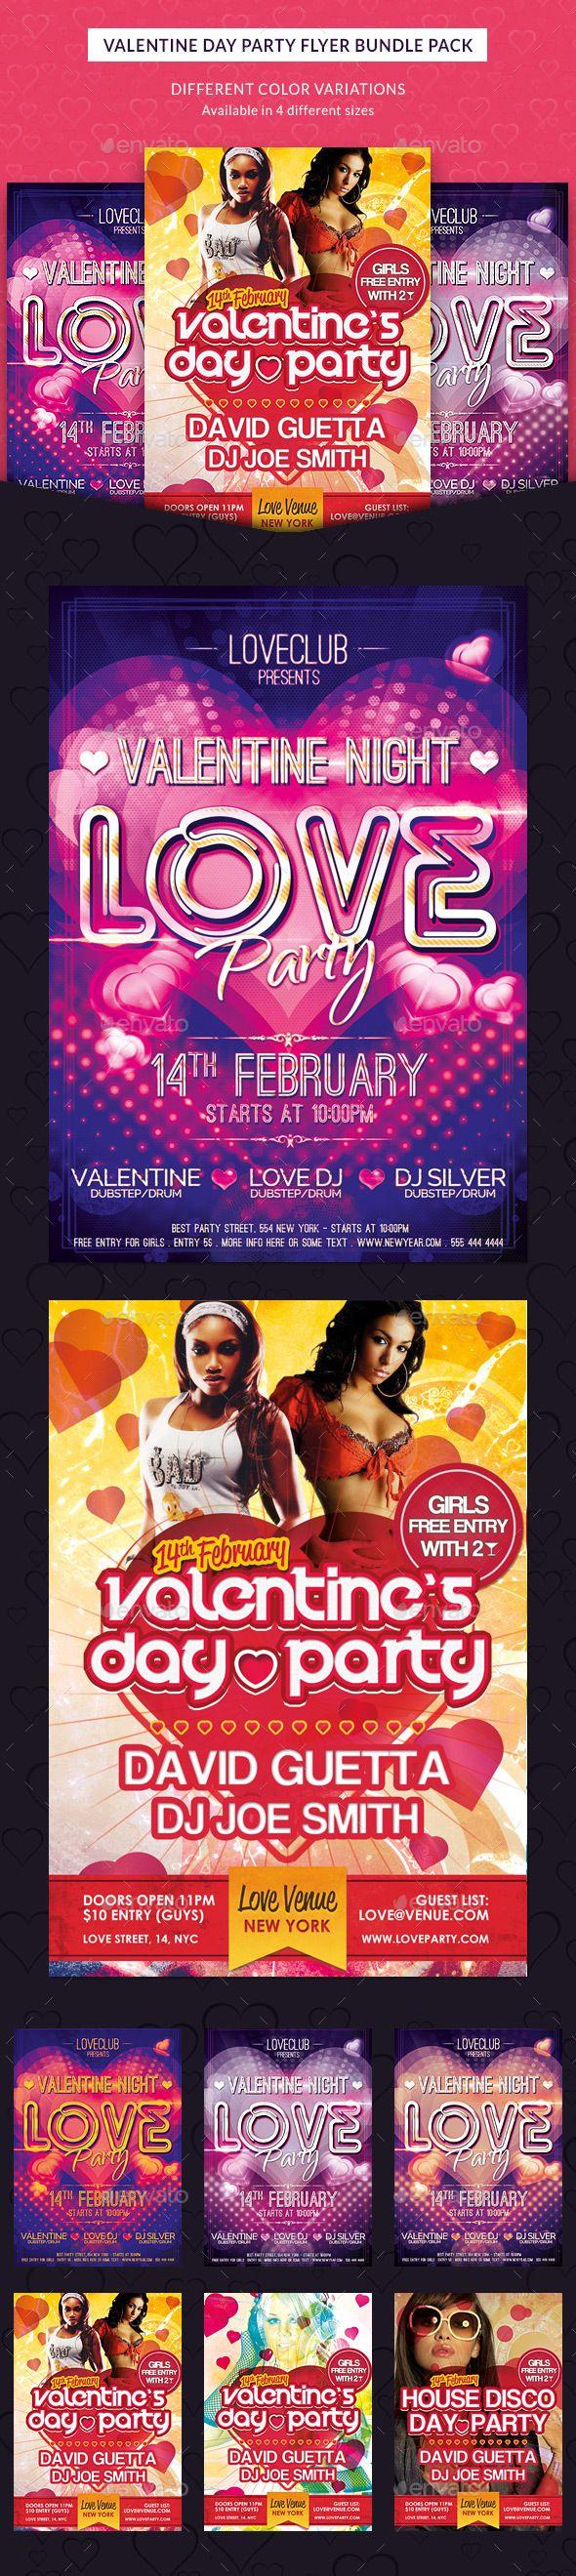 Download Valentine Day Party Flyer Bundle Pack | Valentines day ...